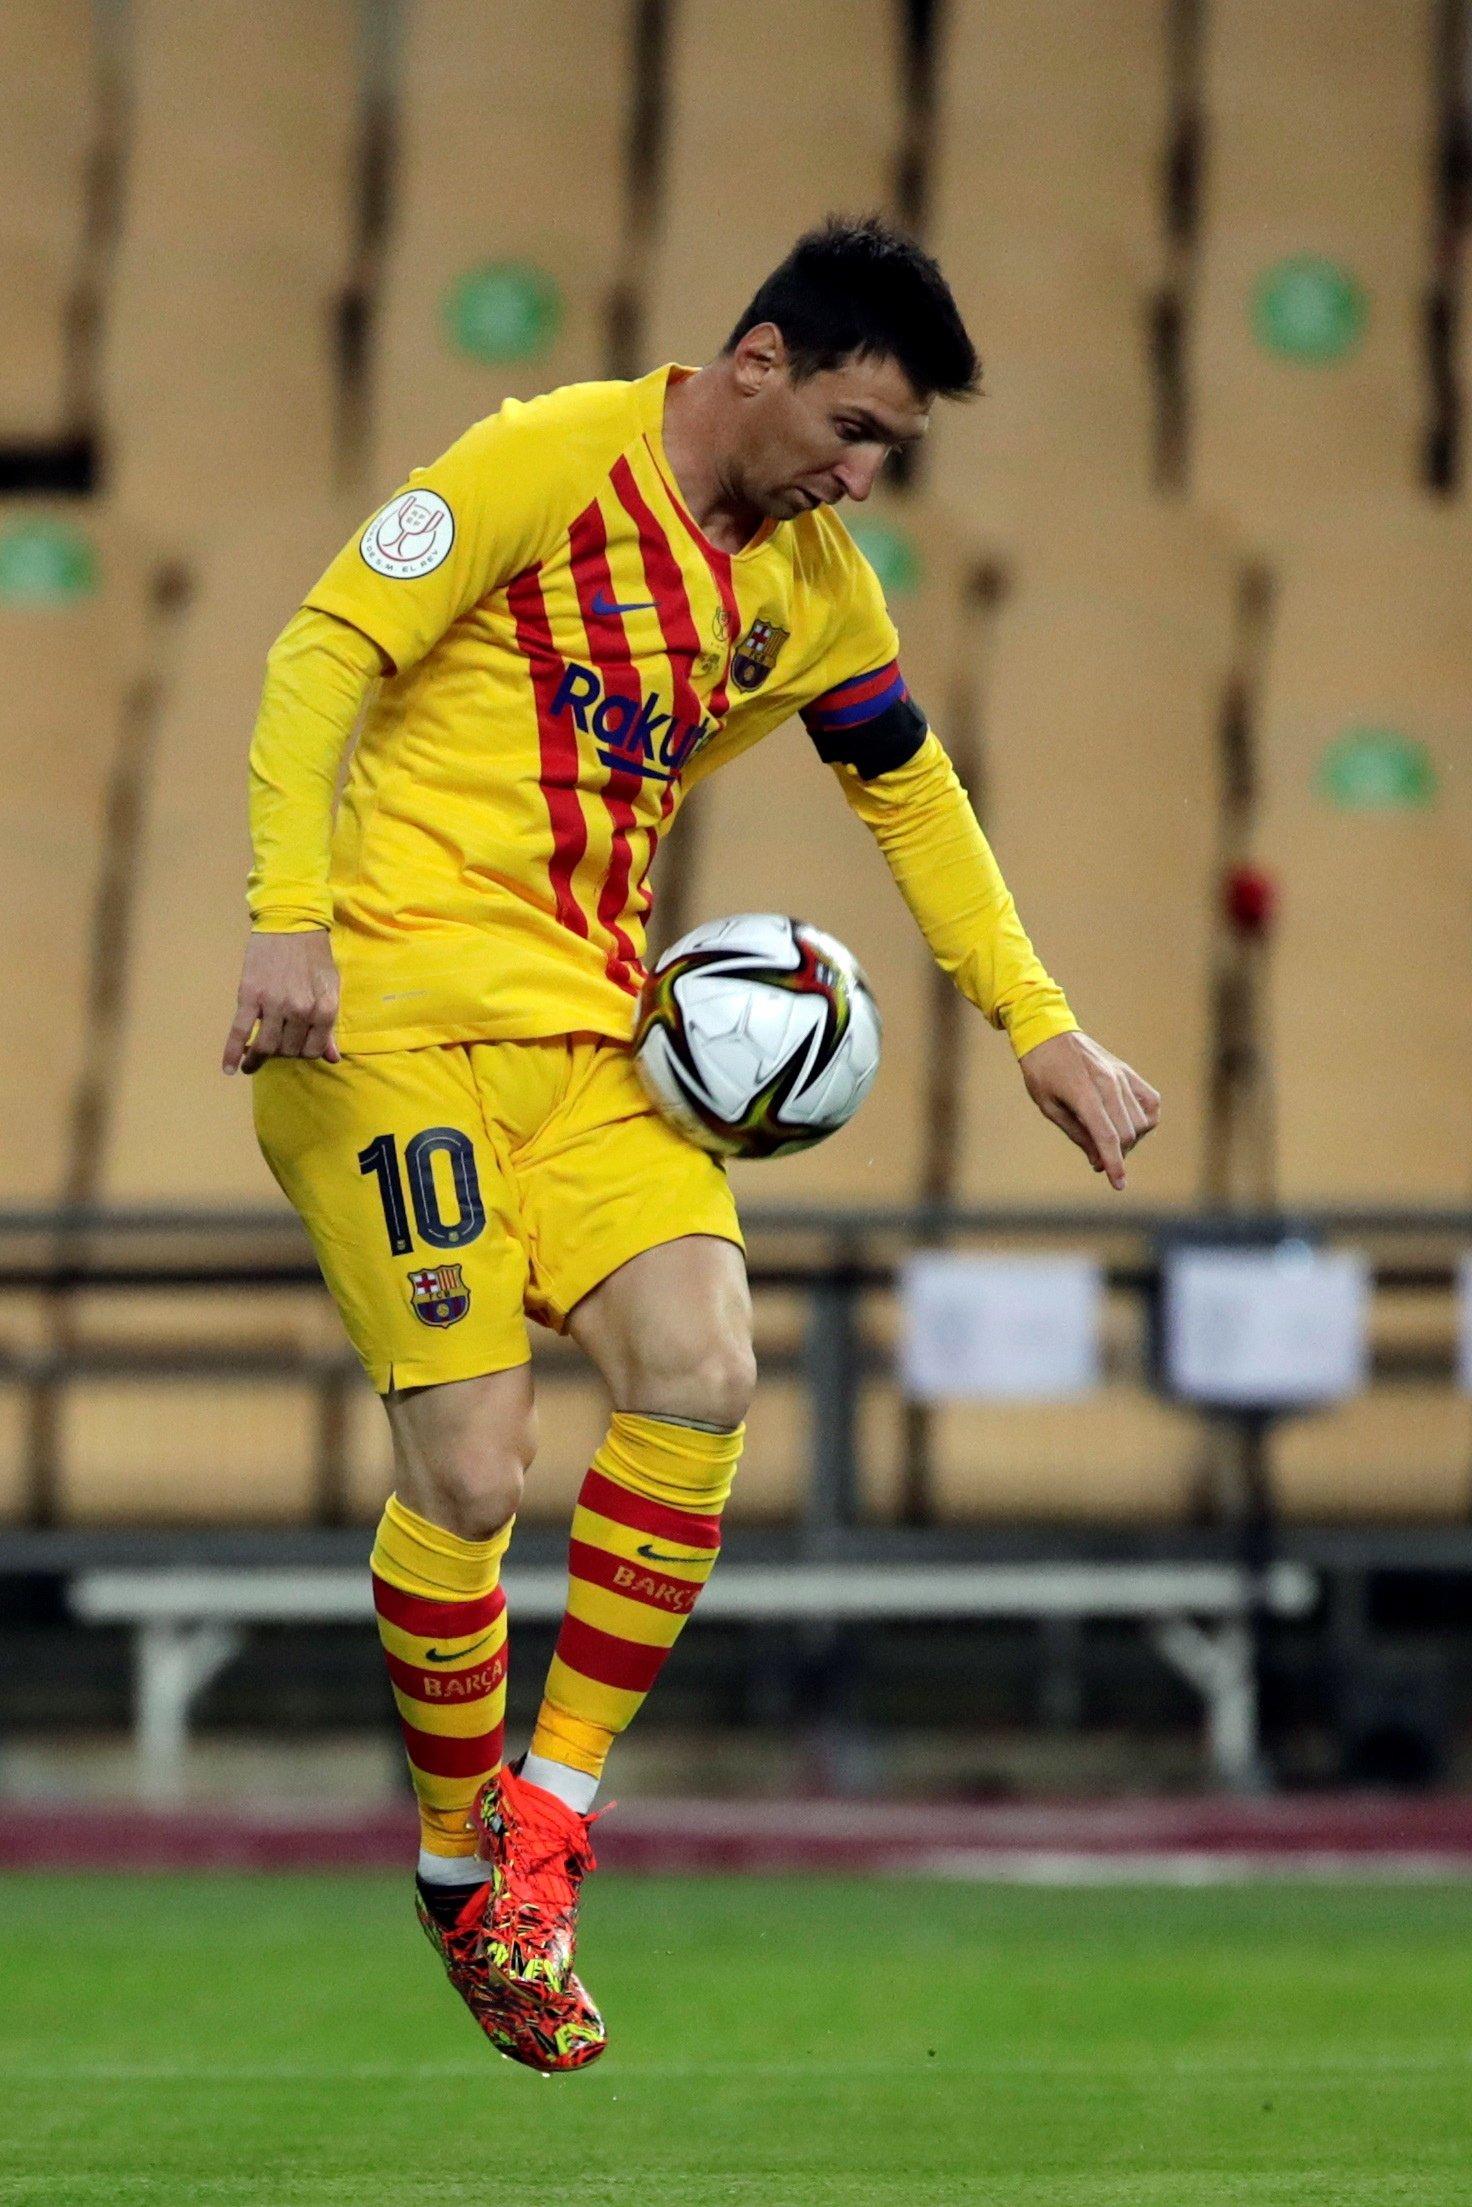 Barcelona's Lionel Messi in action during the 2020/21 Copa del Rey Final, Estadio La Cartuja de Sevilla, Seville, Spain, April 17, 2021. (EPA Photo)